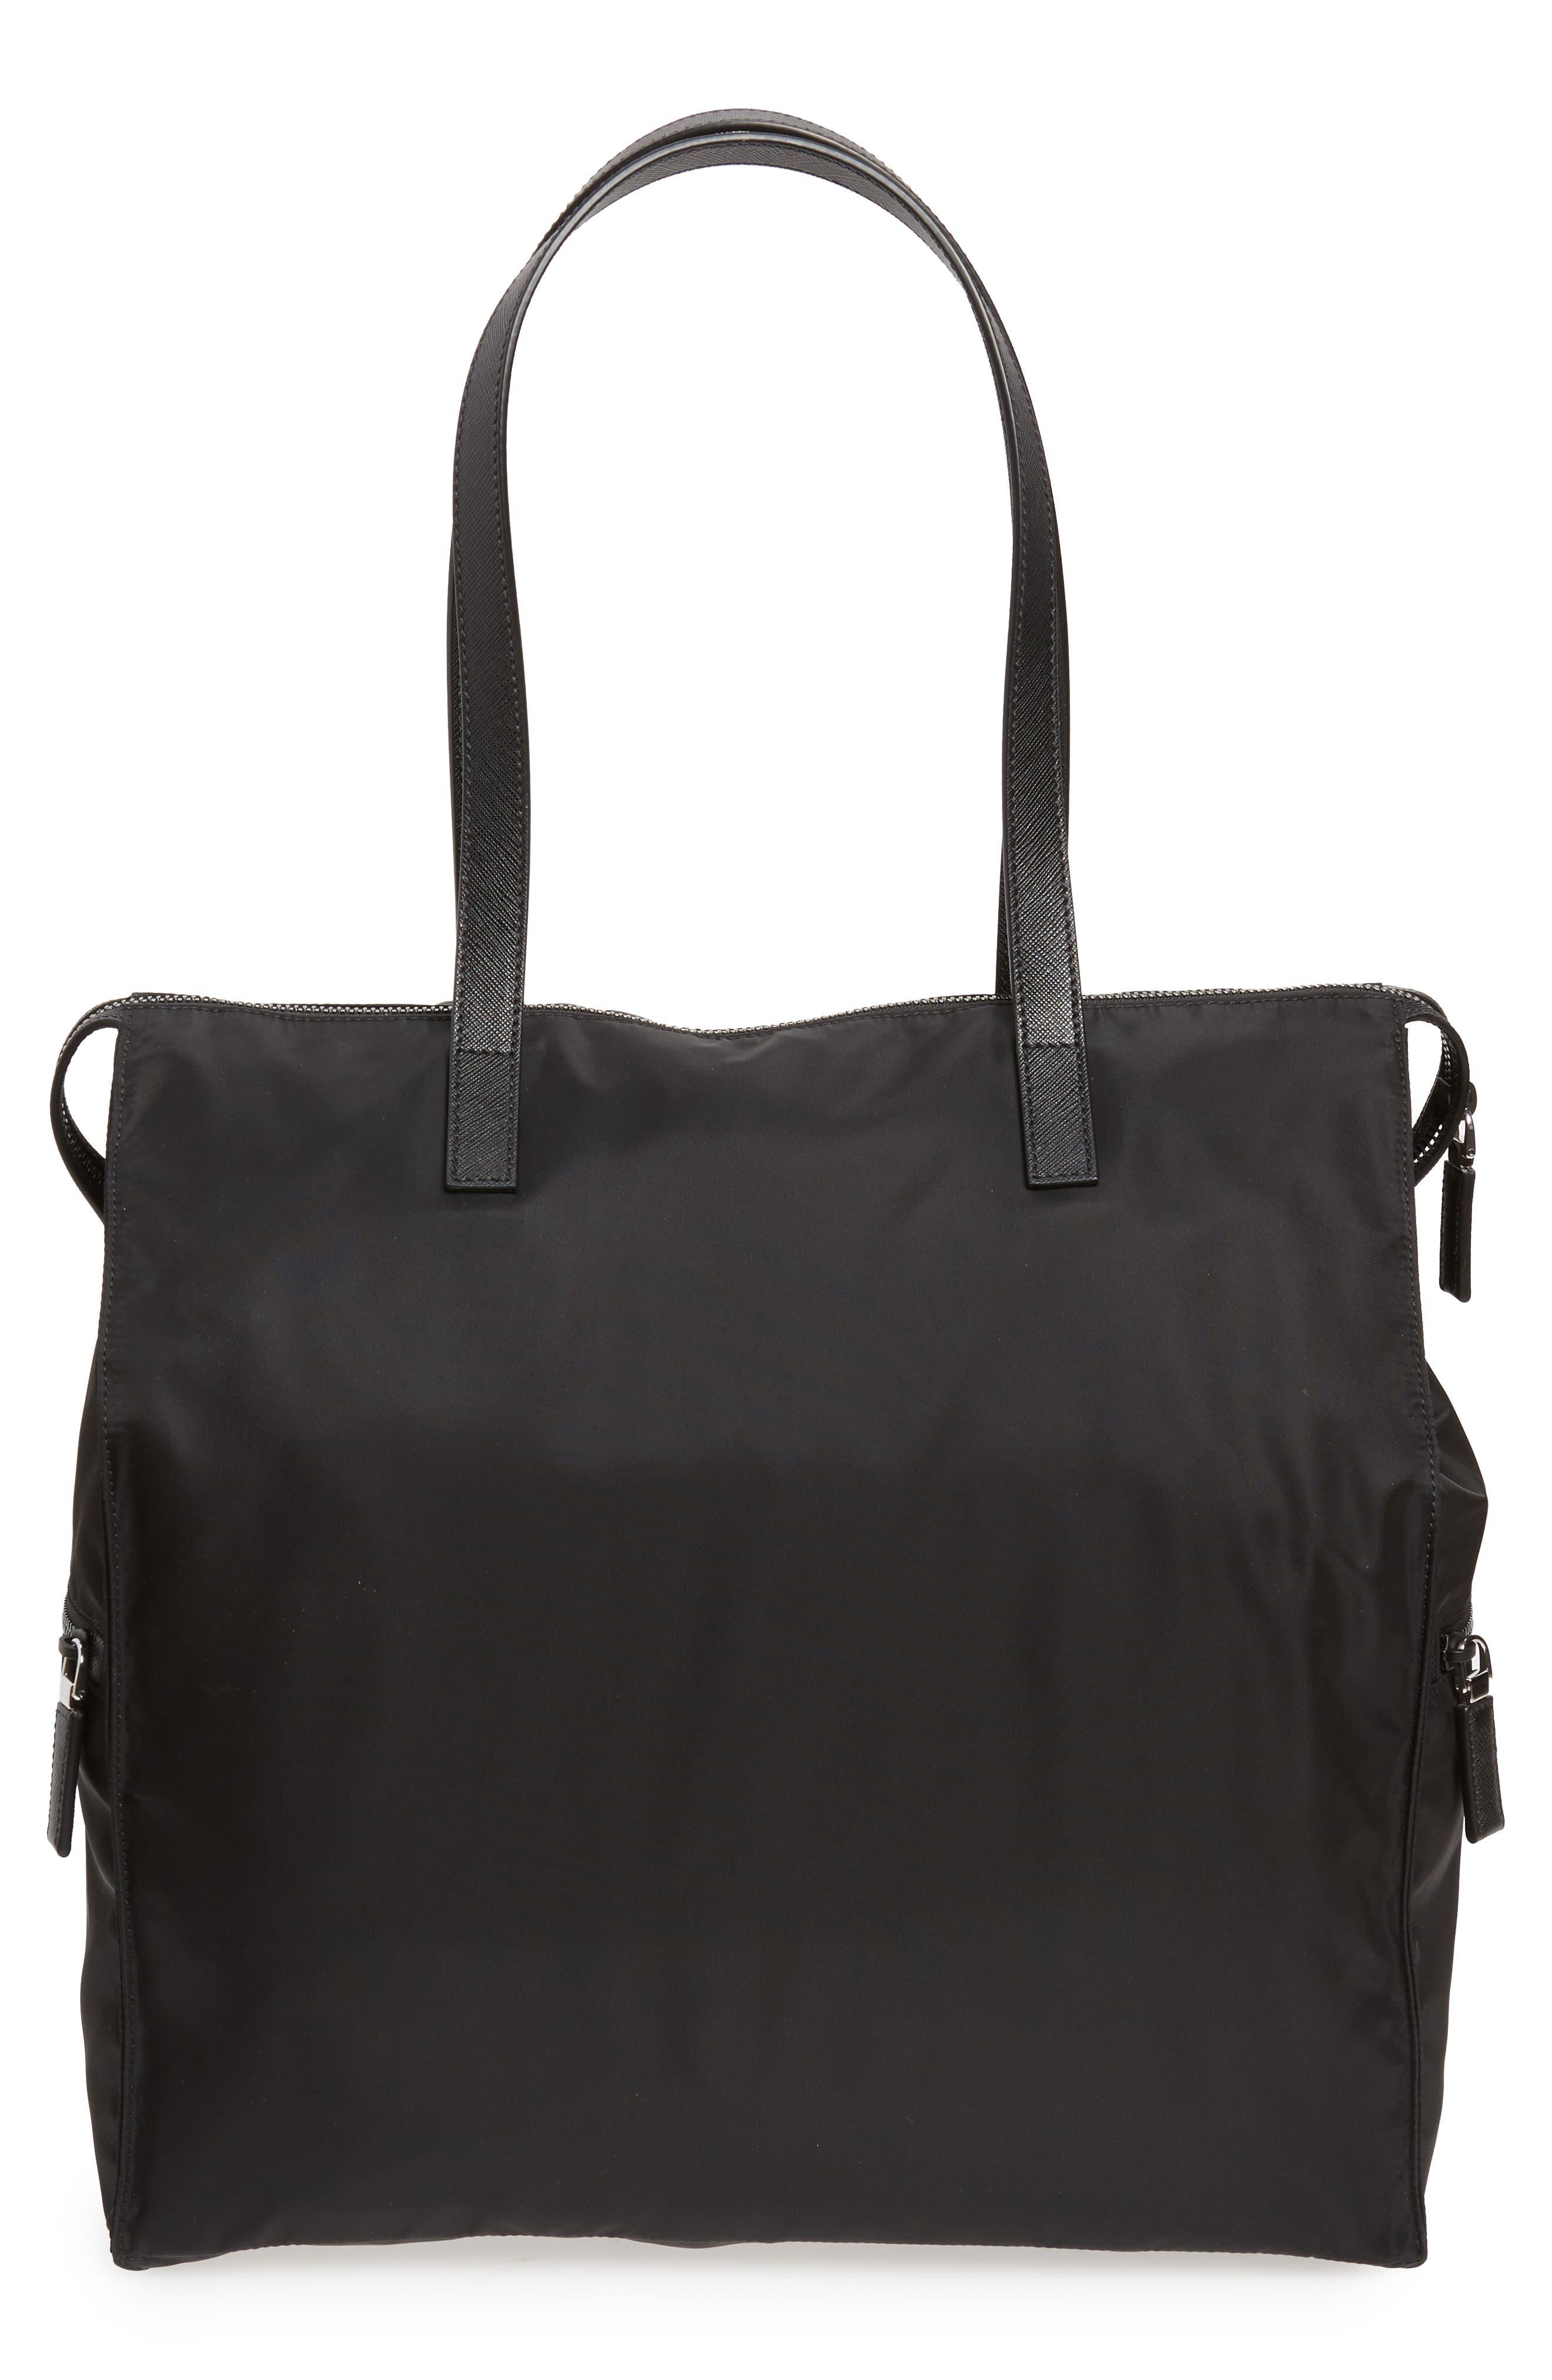 bb9814dfd014 Men's Prada Bags & Backpacks | Nordstrom